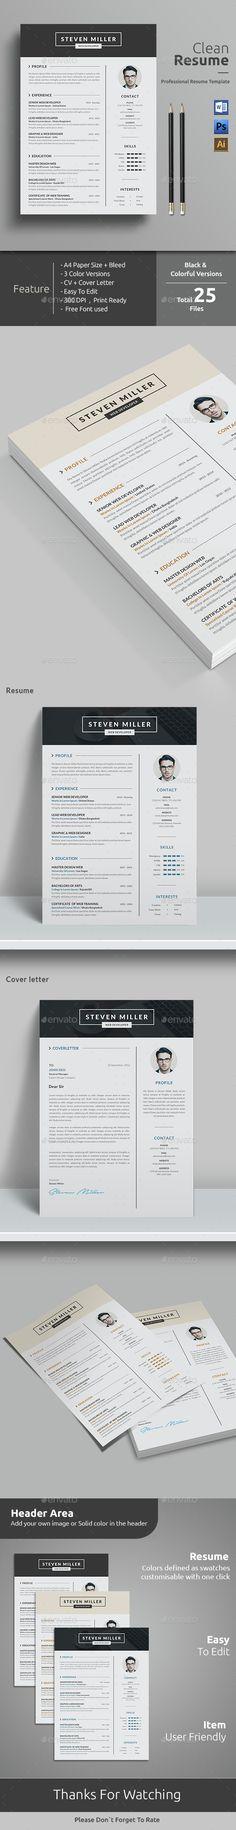 August Kaiser - Resume\/CV Template Cv template, Resume cv and - simple cv template